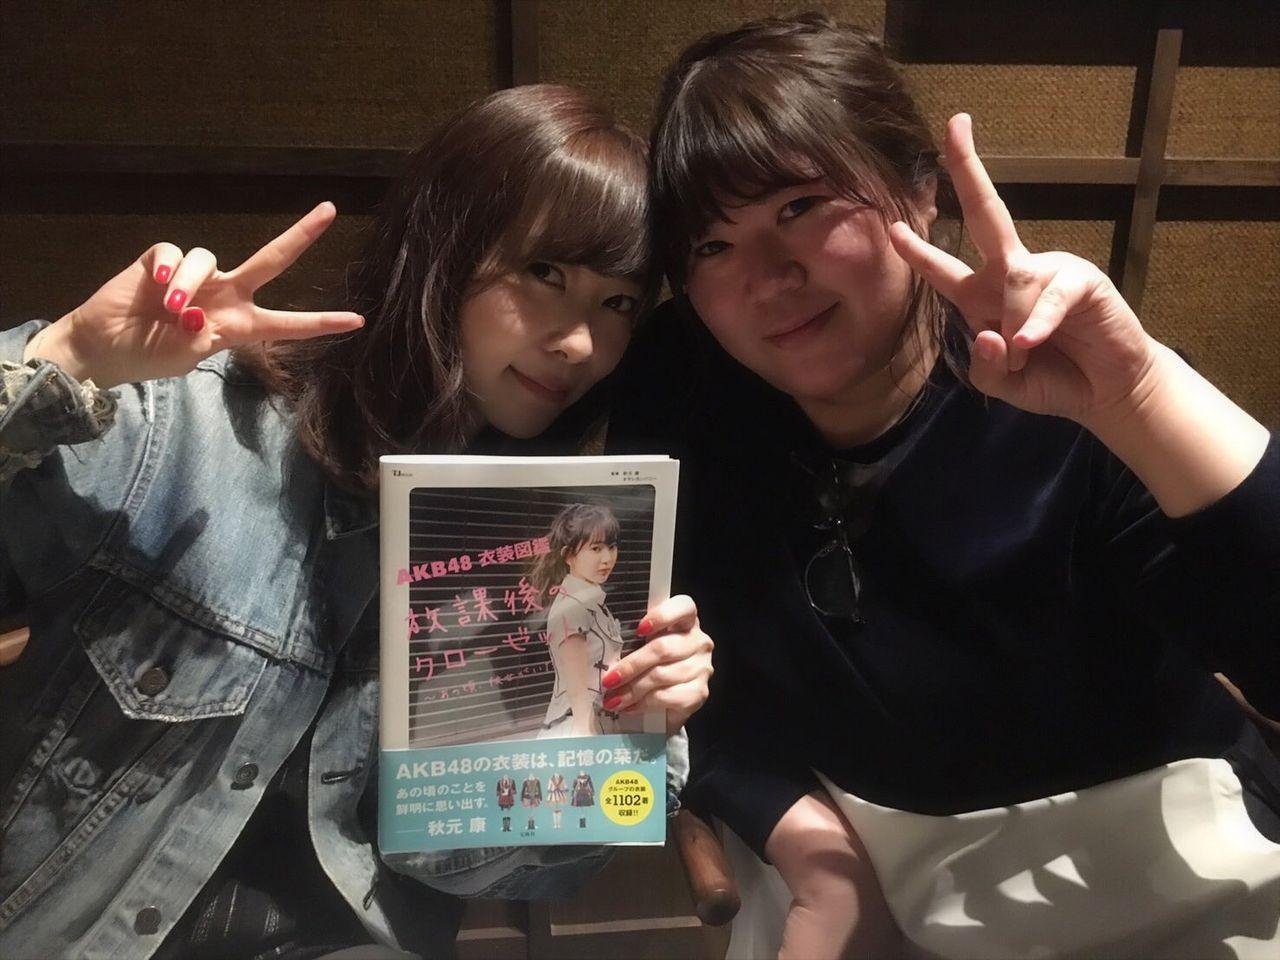 【HKT48】AKB48総選挙サブMC争奪イベントのTV番組メインMCに指原莉乃が就任!